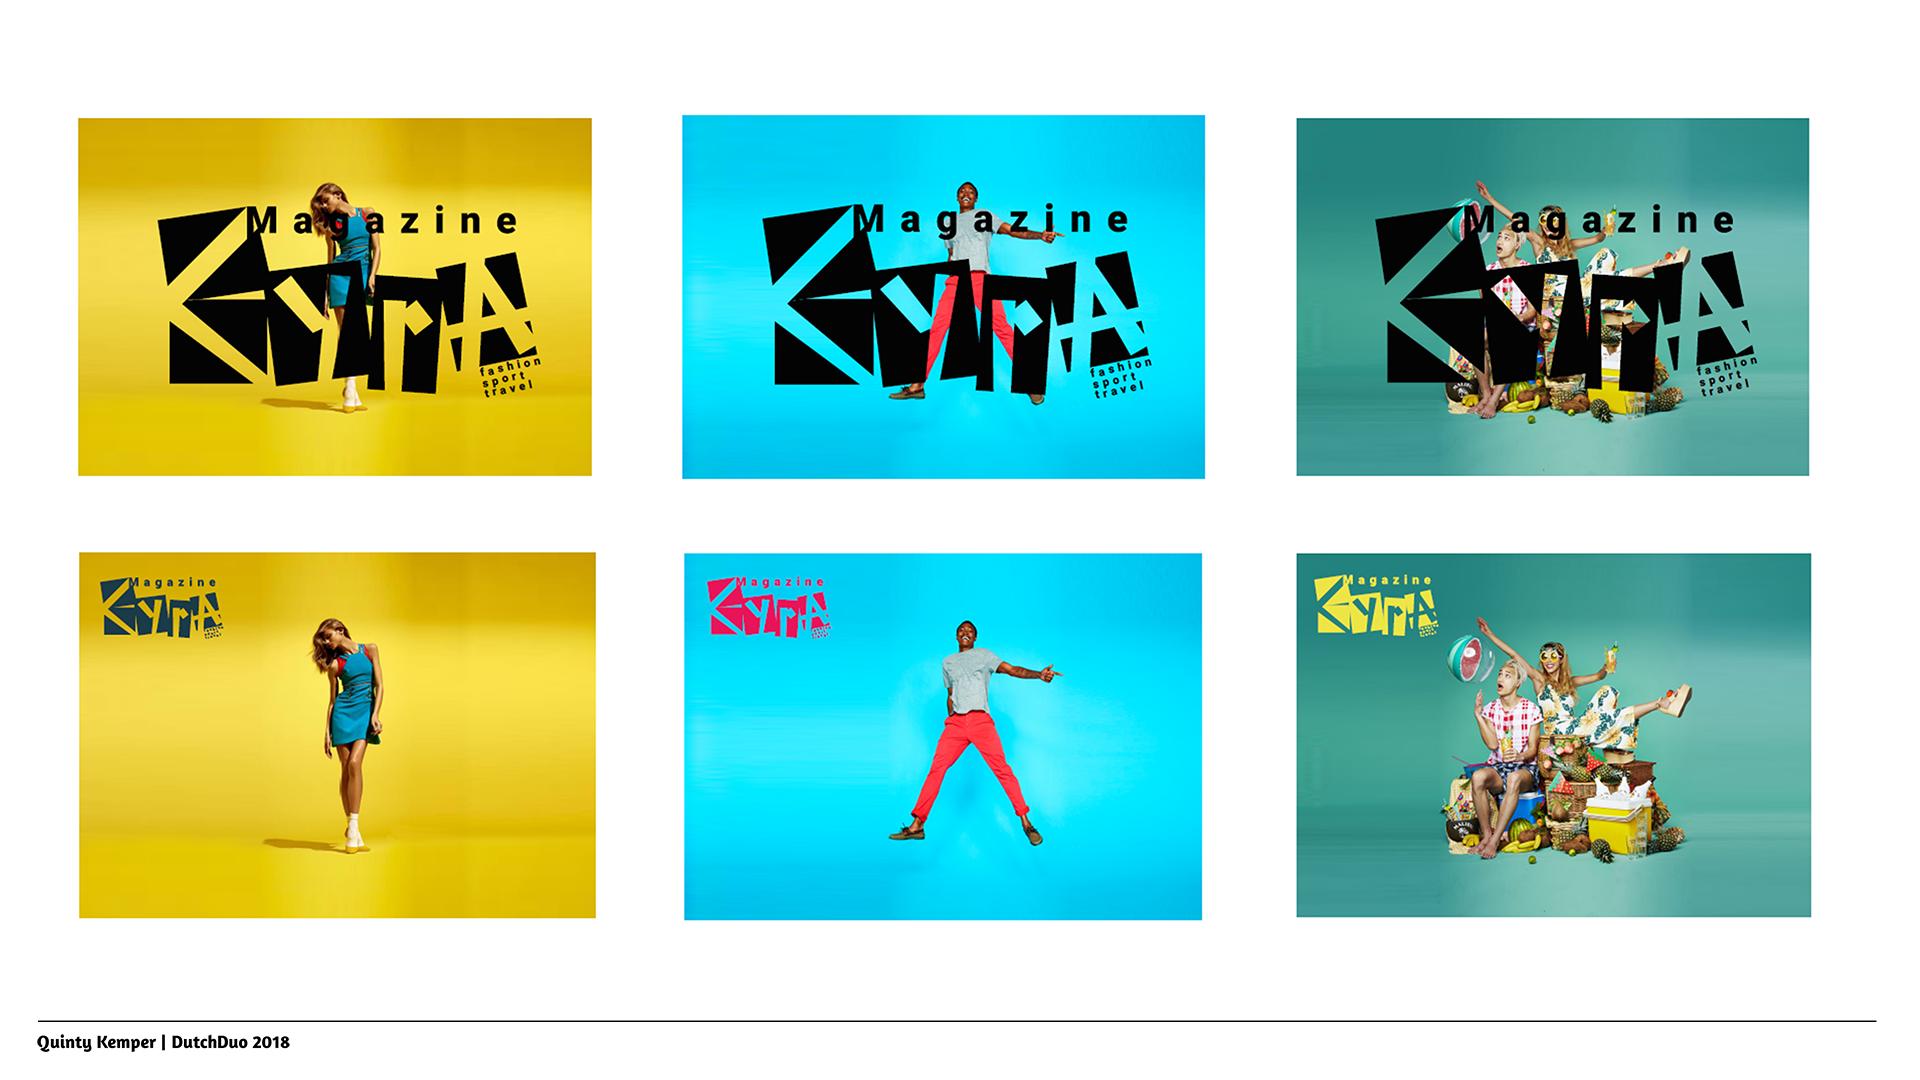 Quinty Kemper Portfolio 2018 Kyra logo 2 key images